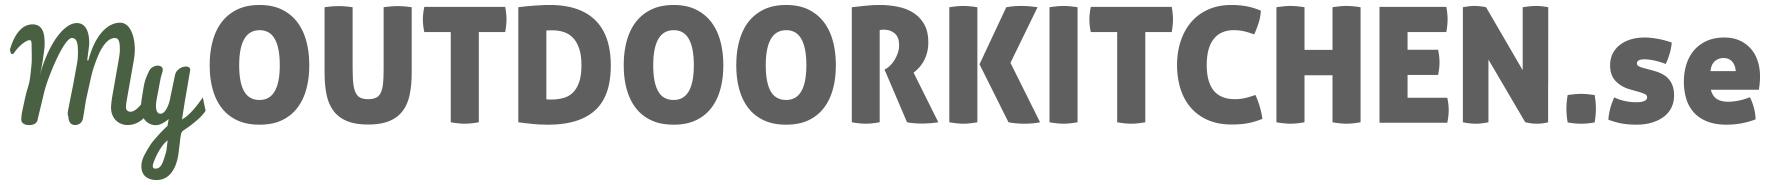 myoutdoorkitchen-logo-2017